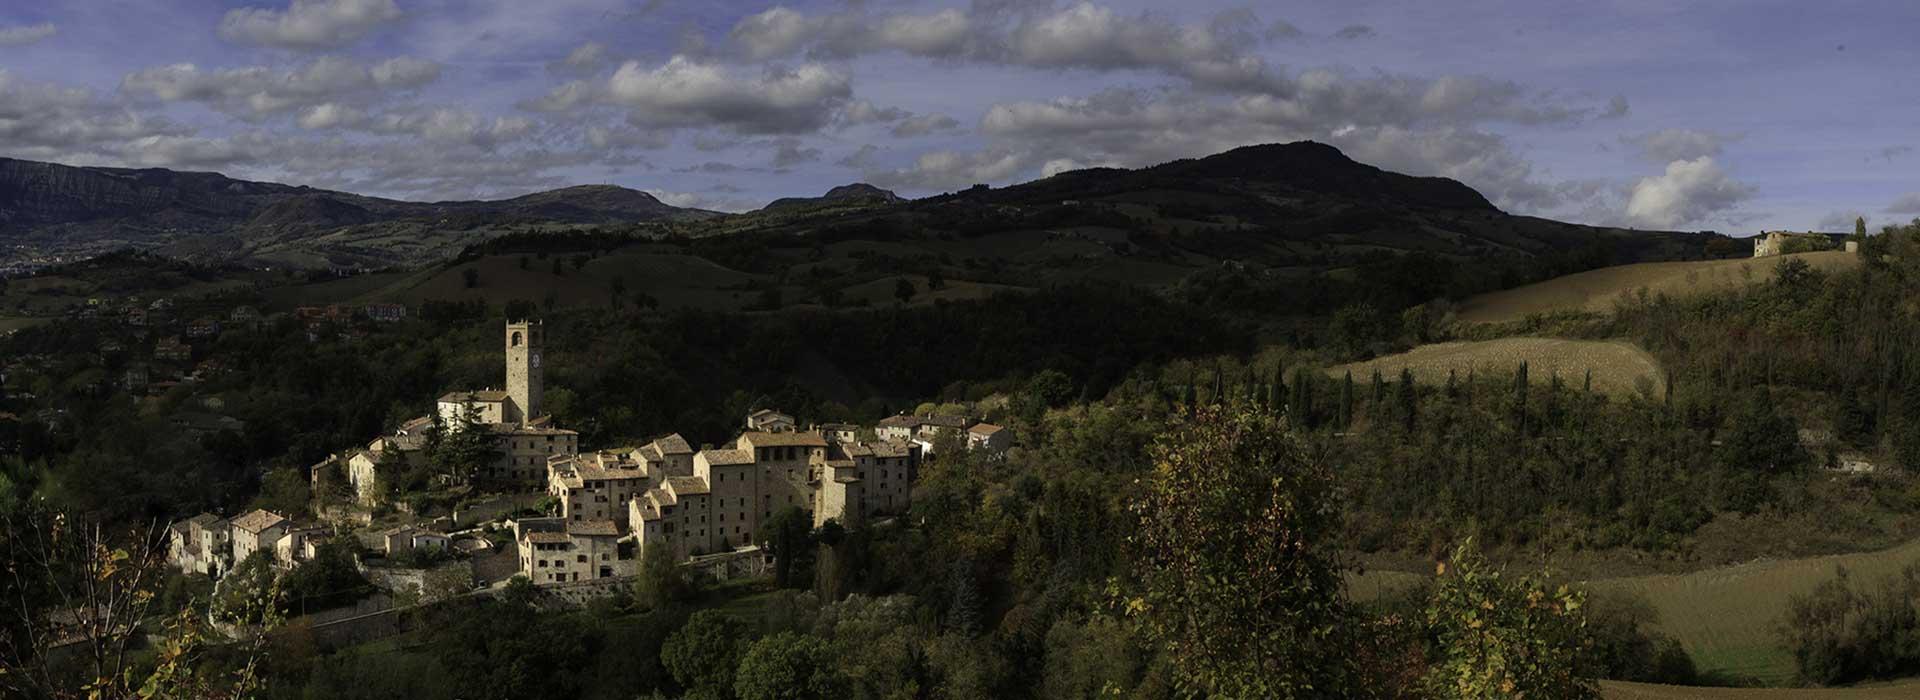 montefeltro-macerata-feltria